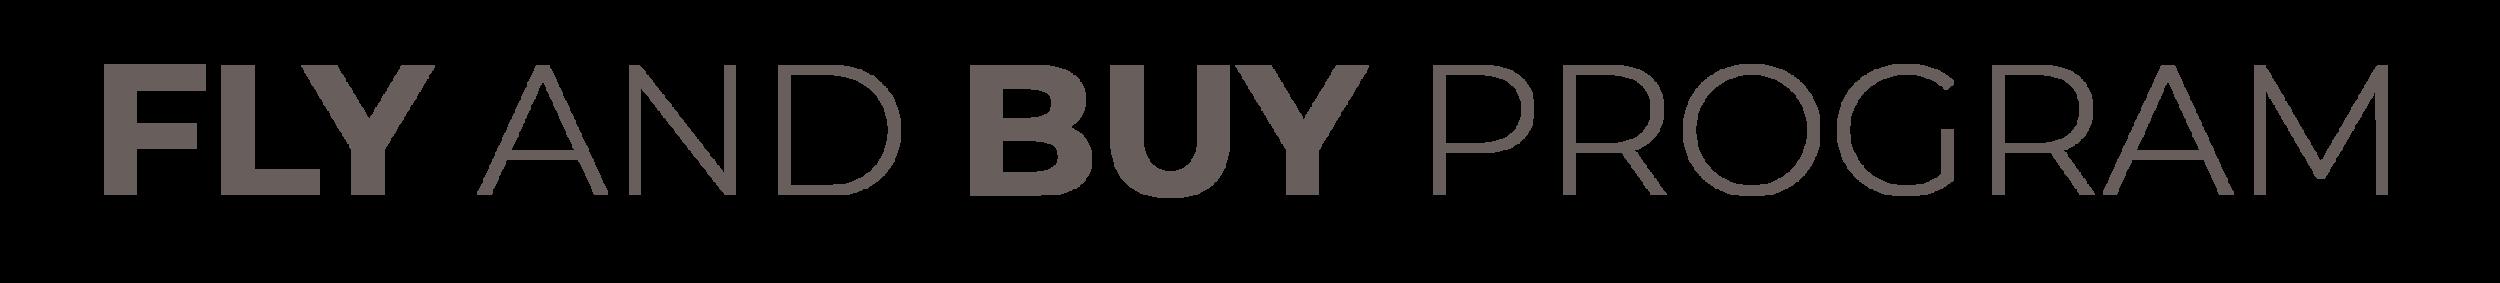 flyandbuybranding_tipos-04.png